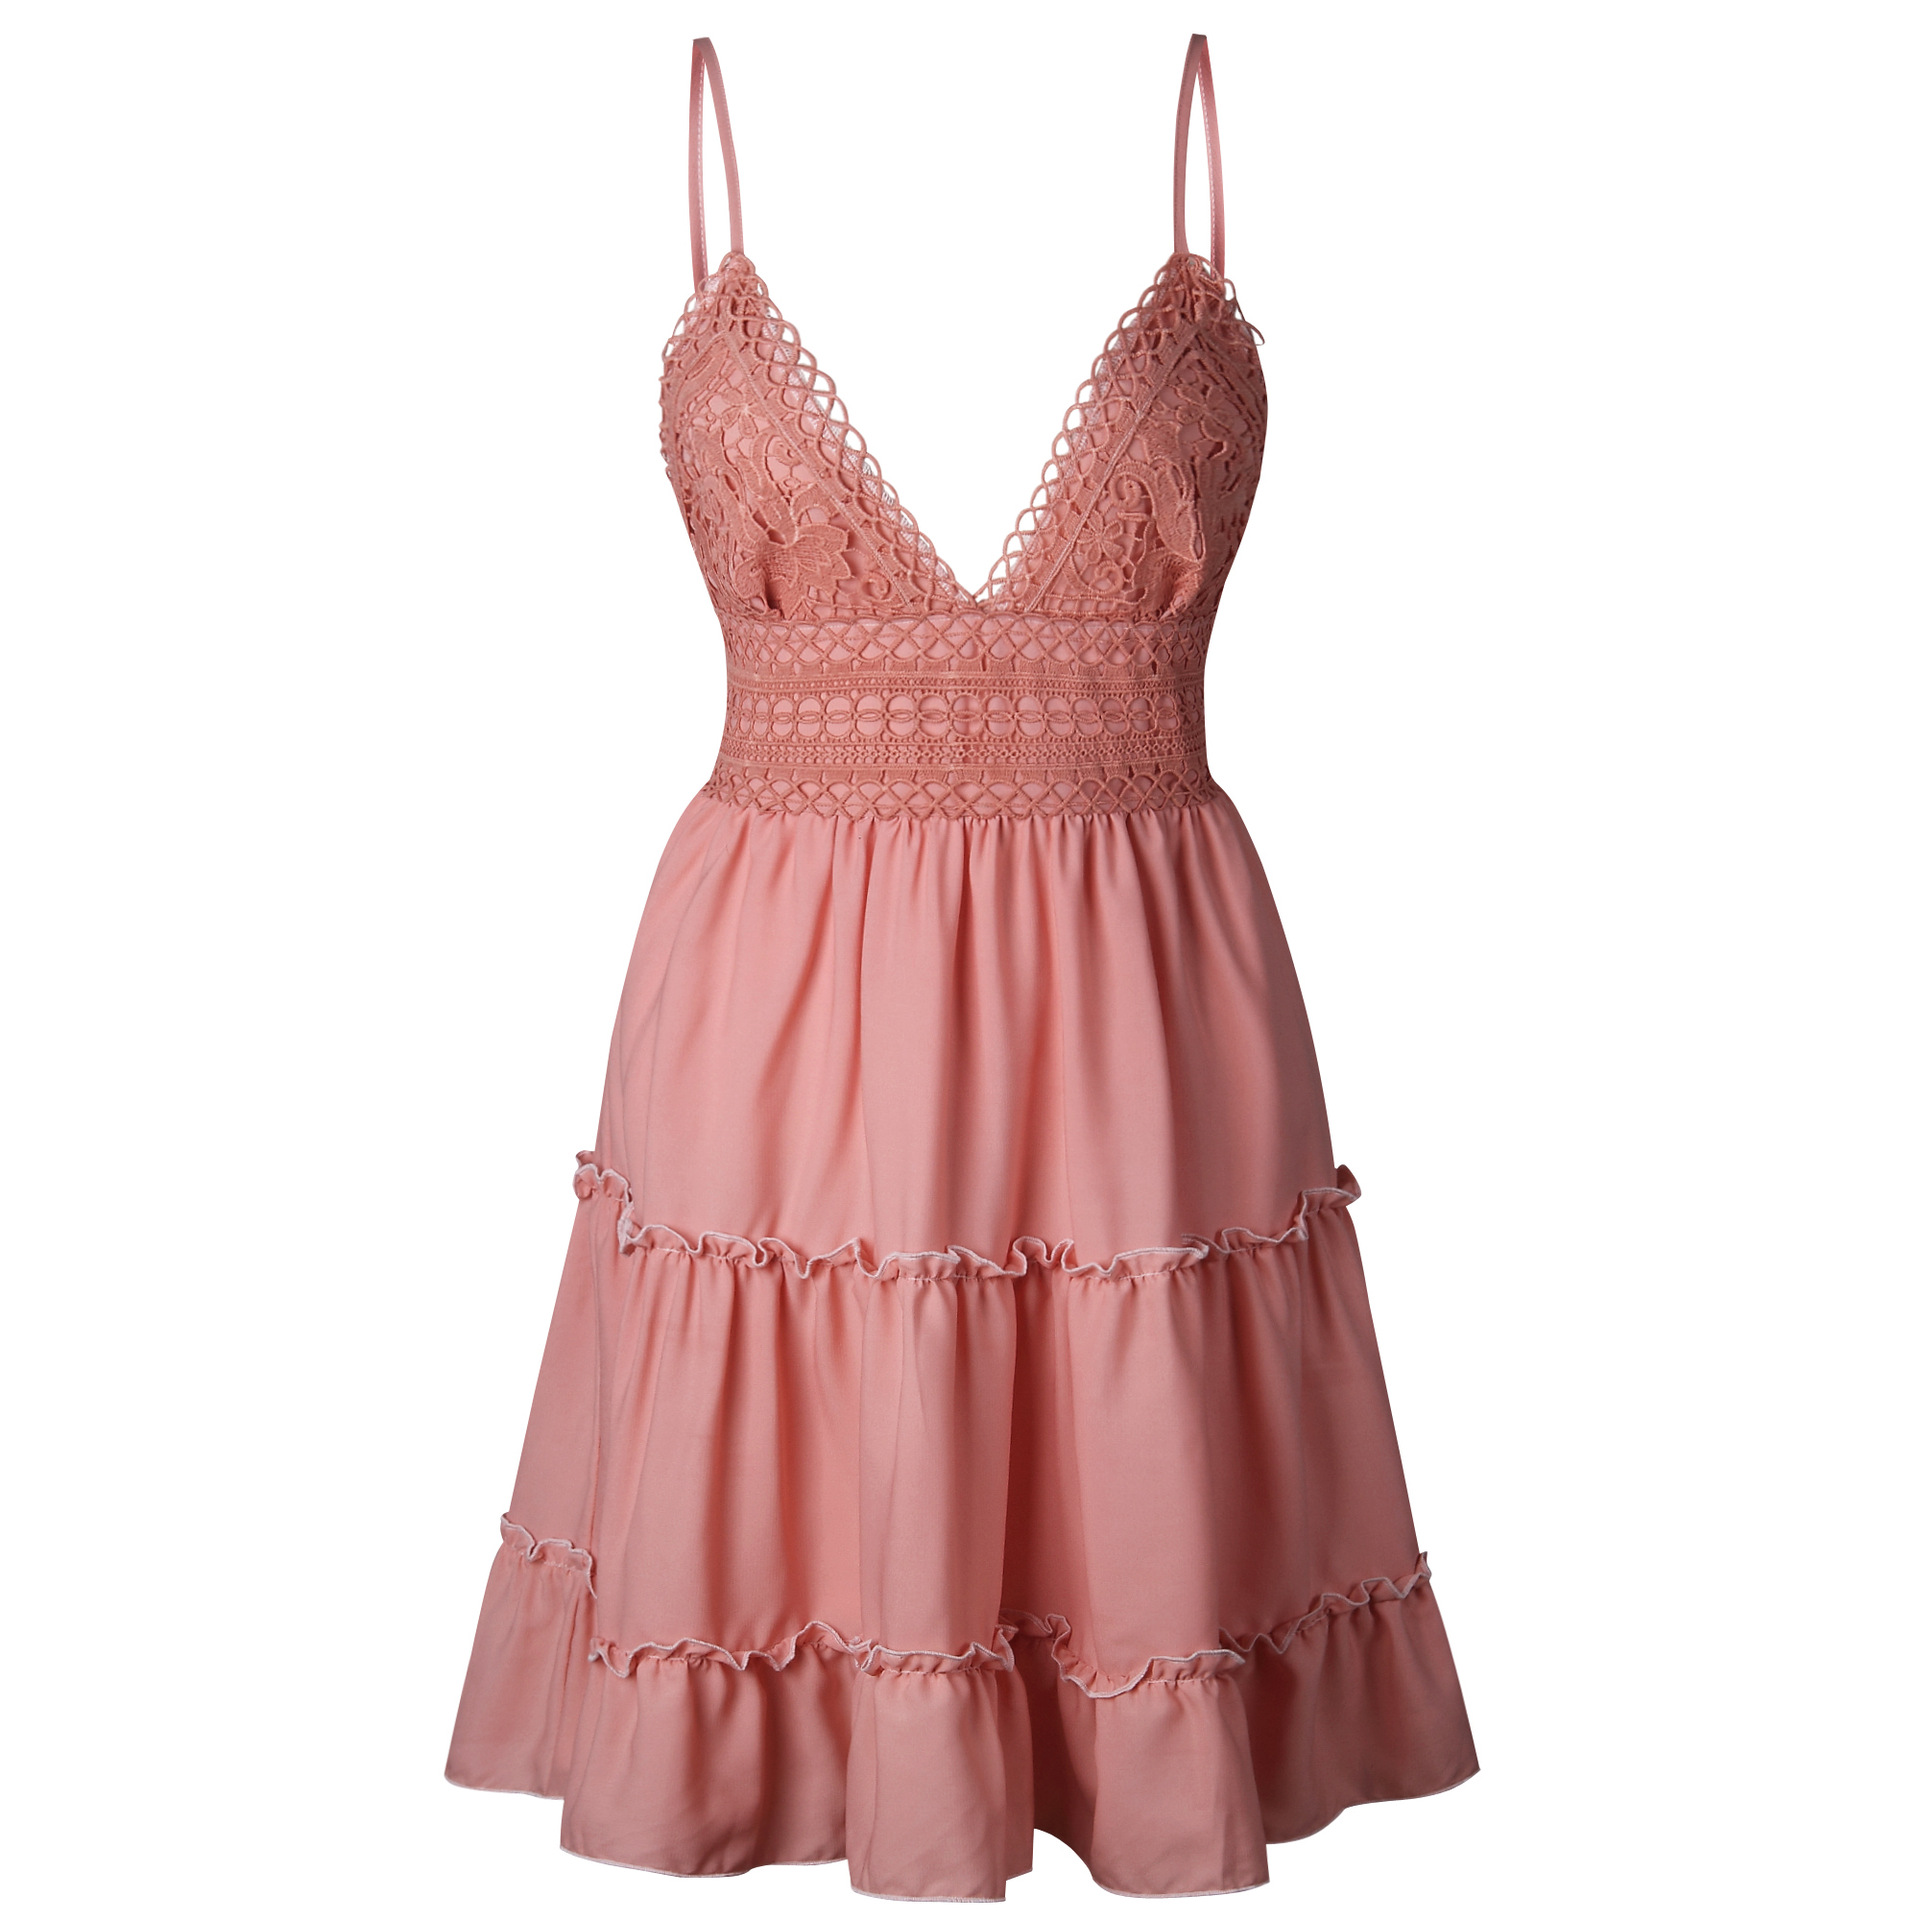 Summer Women White Lace Halter Dress Sexy Backless Beach Dresses 2020 Fashion Sleeveless Spaghetti Strap Casual Mini Sundress 3